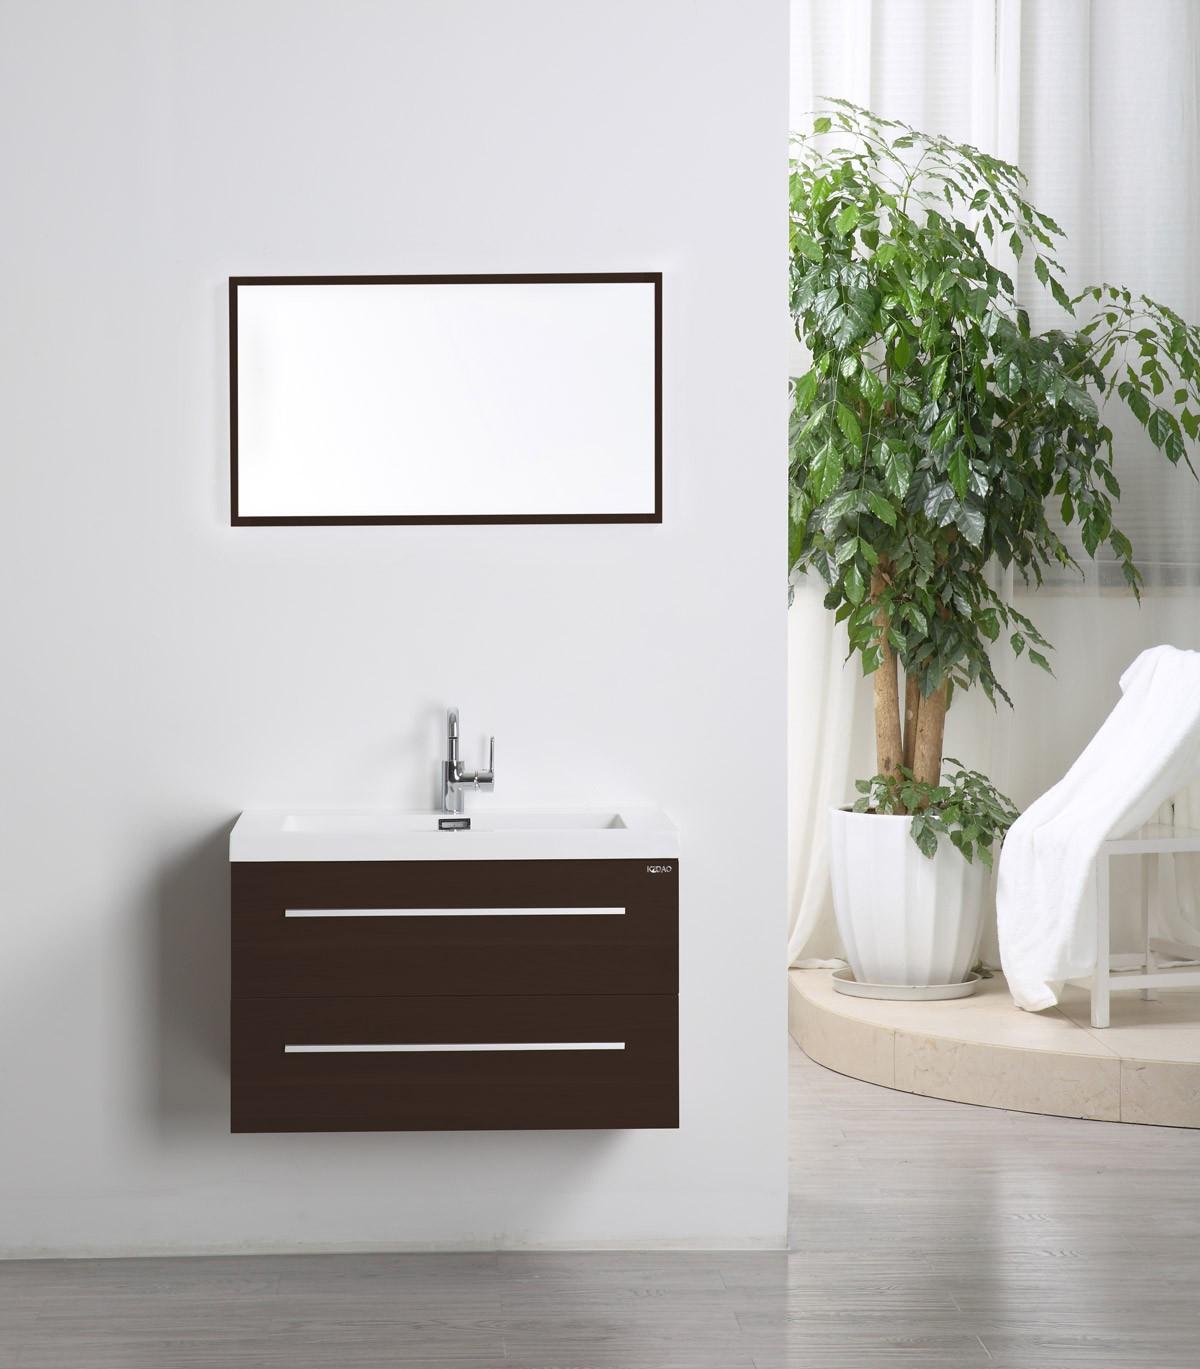 Madrid Waschtisch Set 80 Cm Mokka Badewelt Badezimmer Mobel